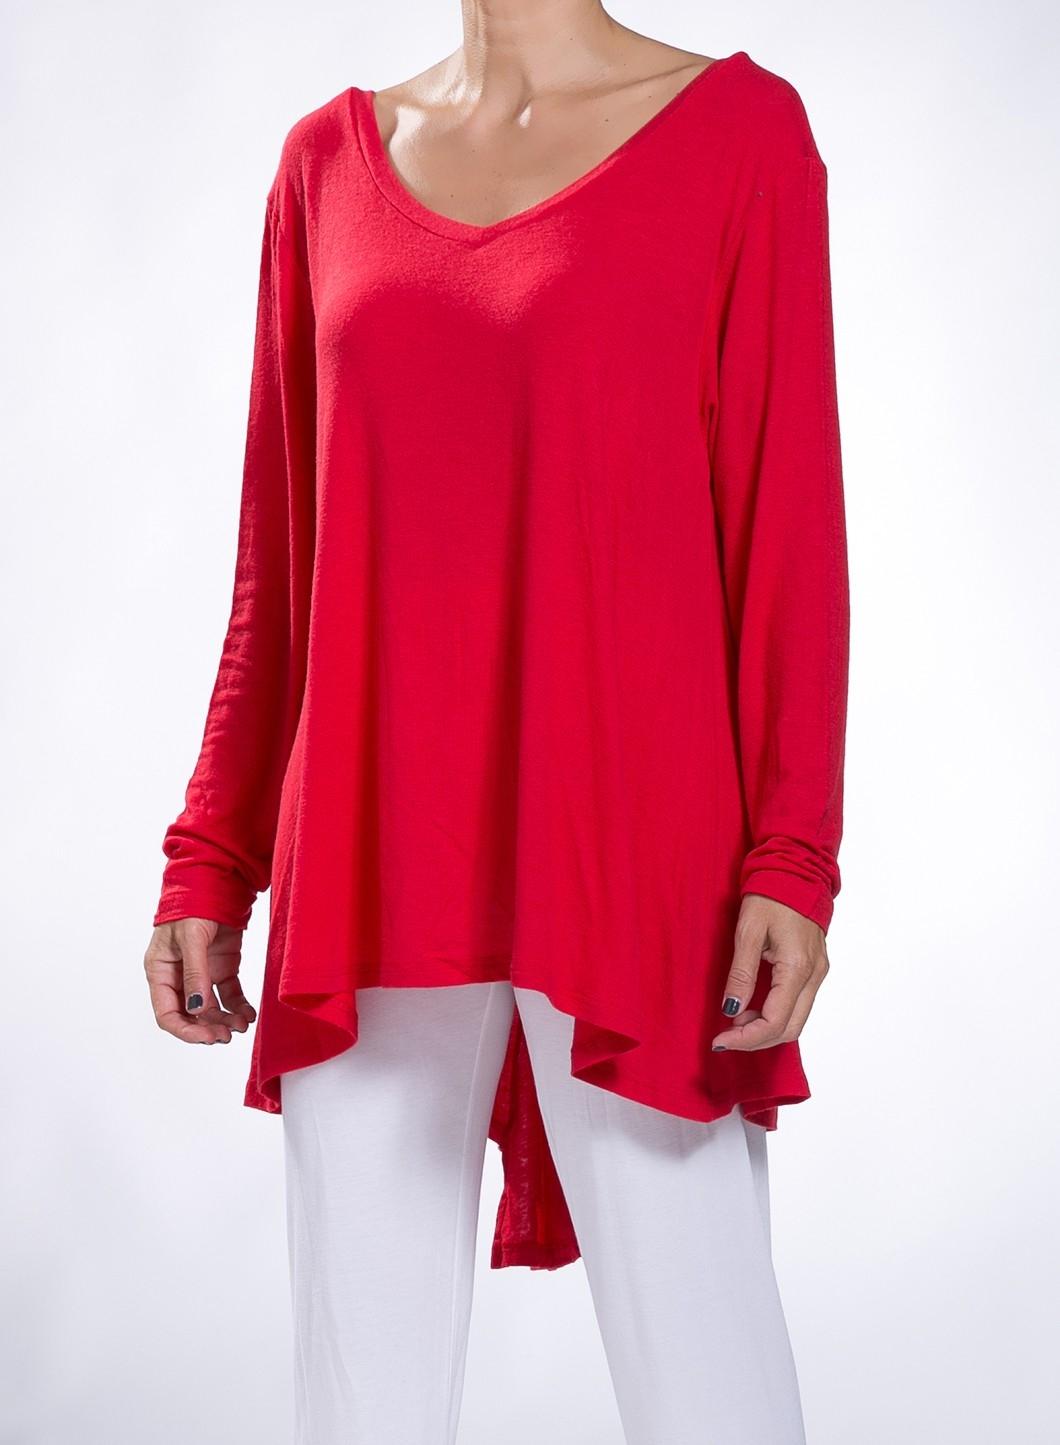 Models of Women's Wool Blouses